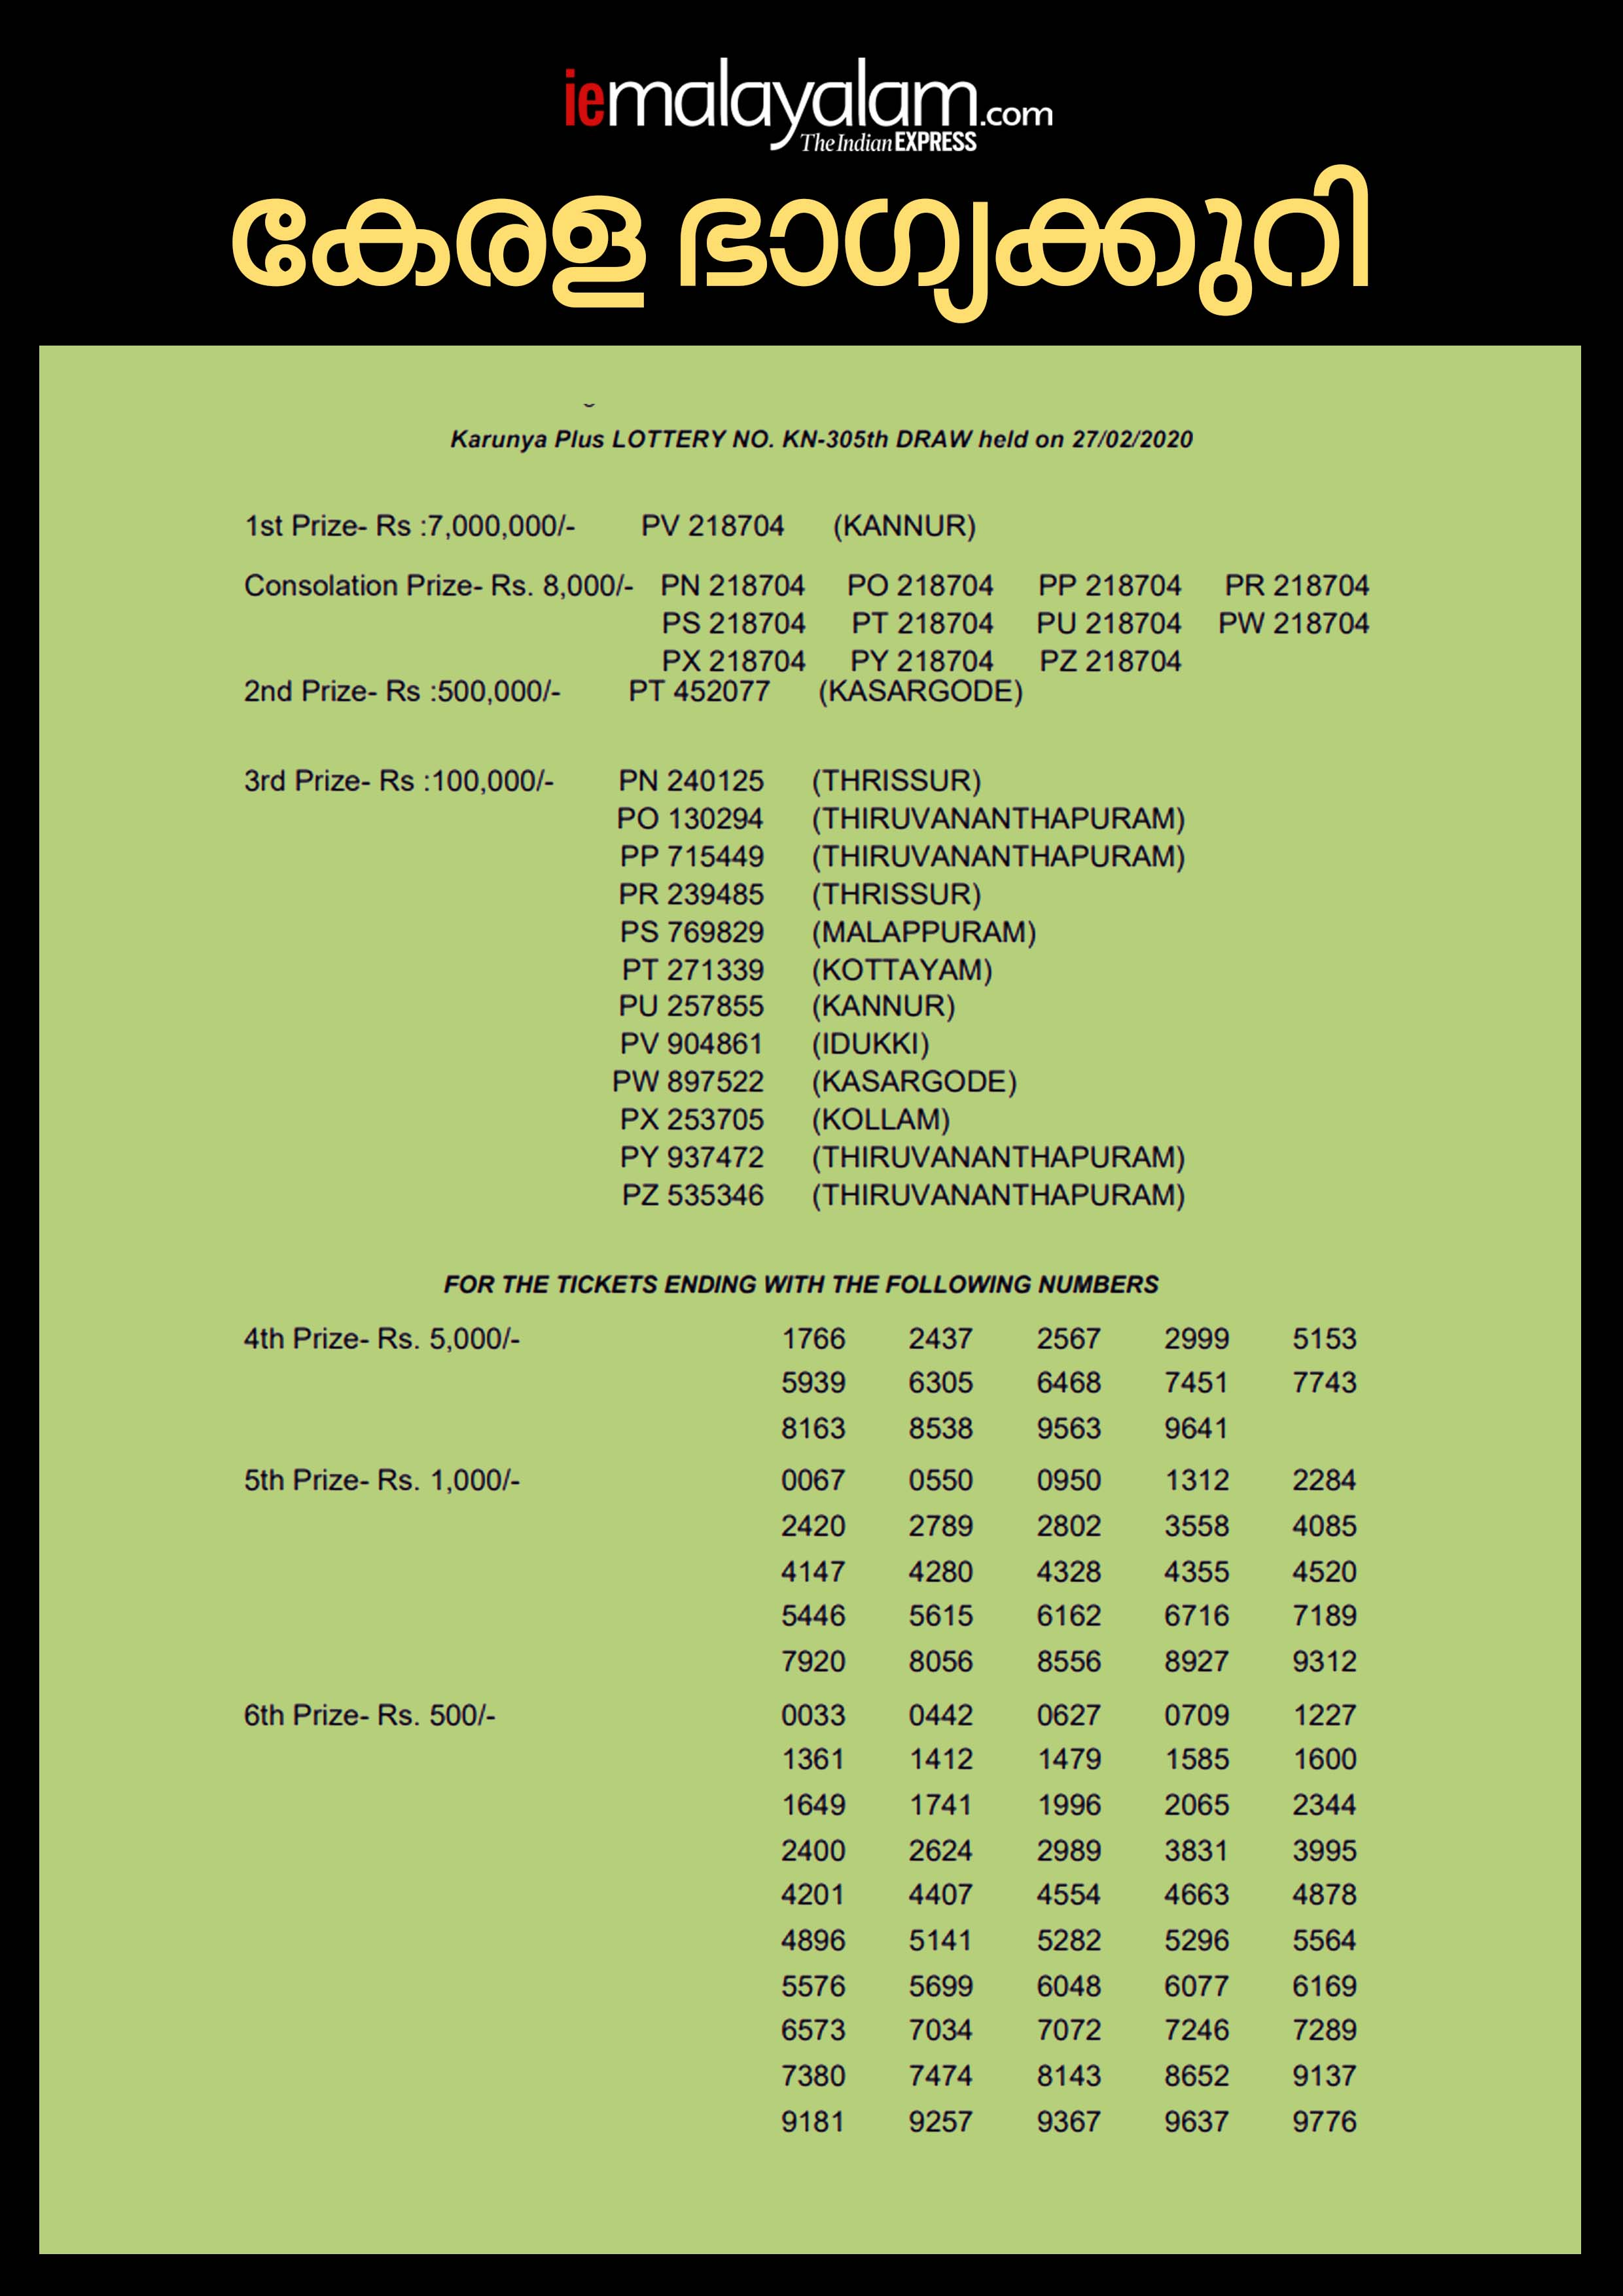 Kerala Karunya Plus KN-305 Lottery Result, kerala lottery, ie malayalam